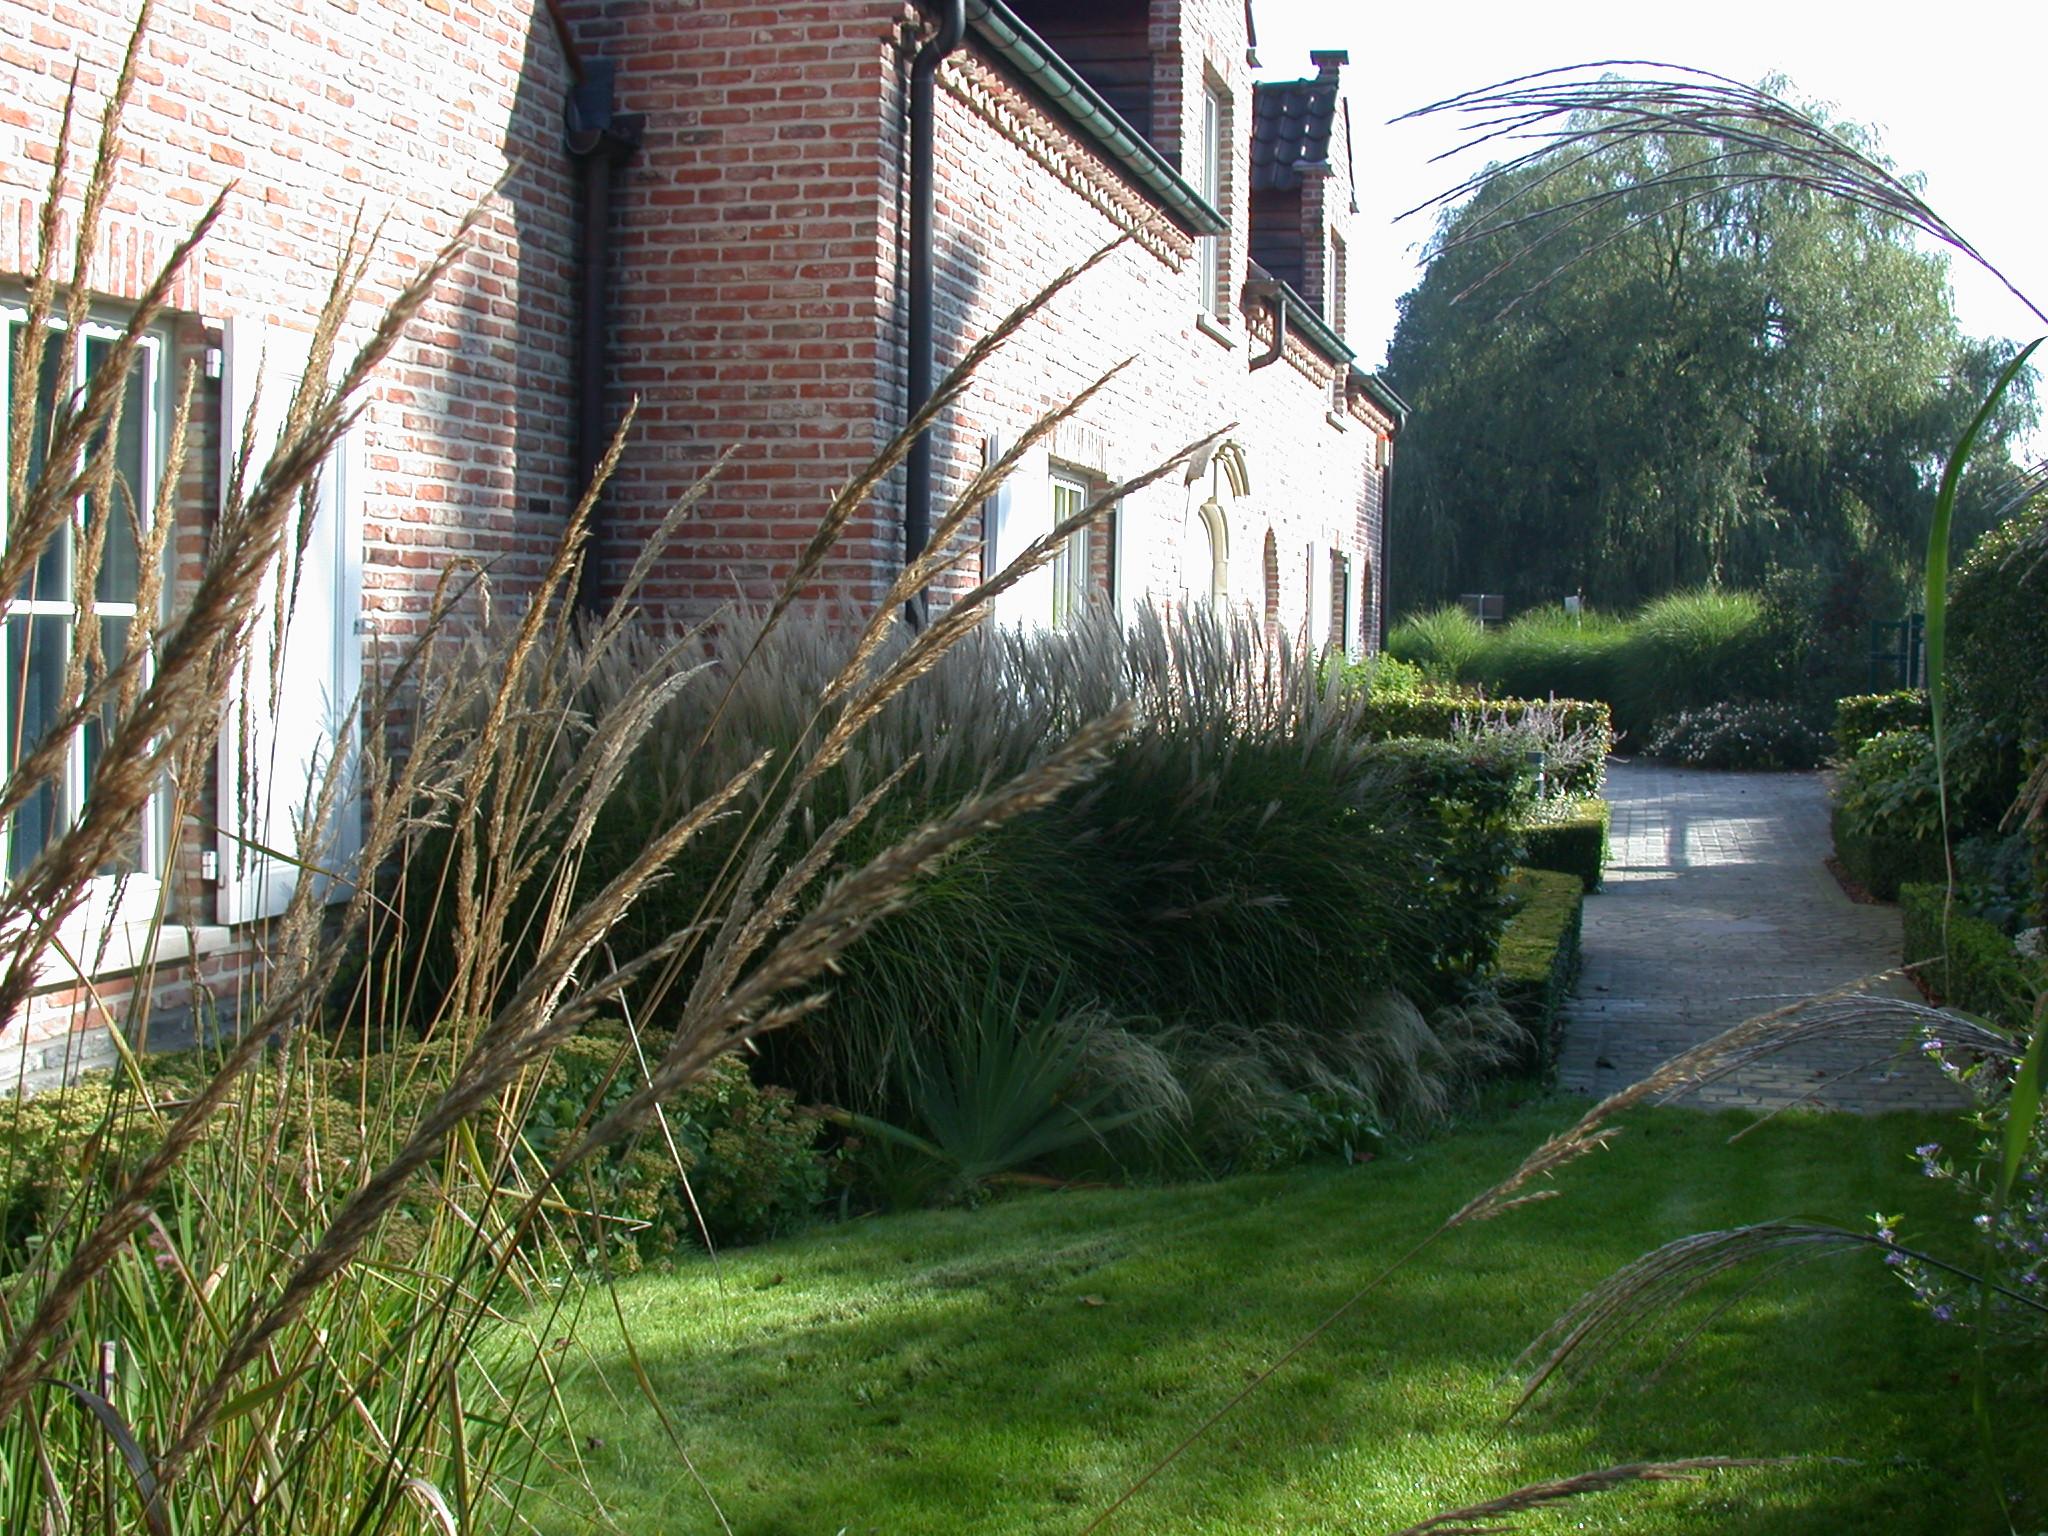 Jardin andalou art landscape architecte paysagiste for Architecte jardin